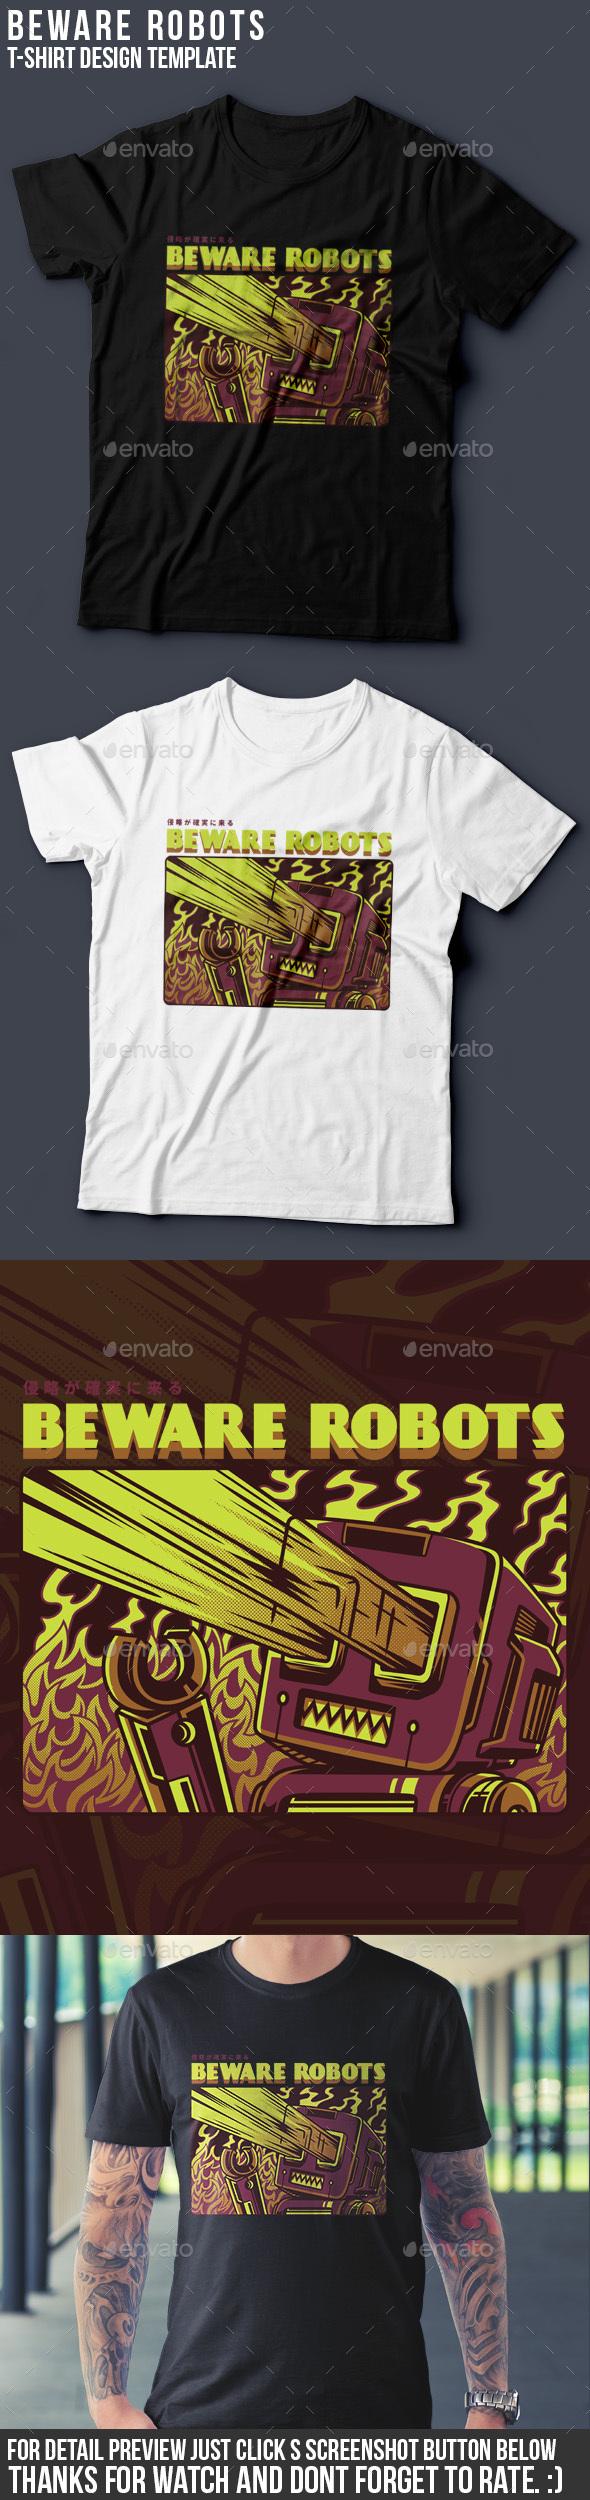 Beware Robots T-Shirt Design - Grunge Designs